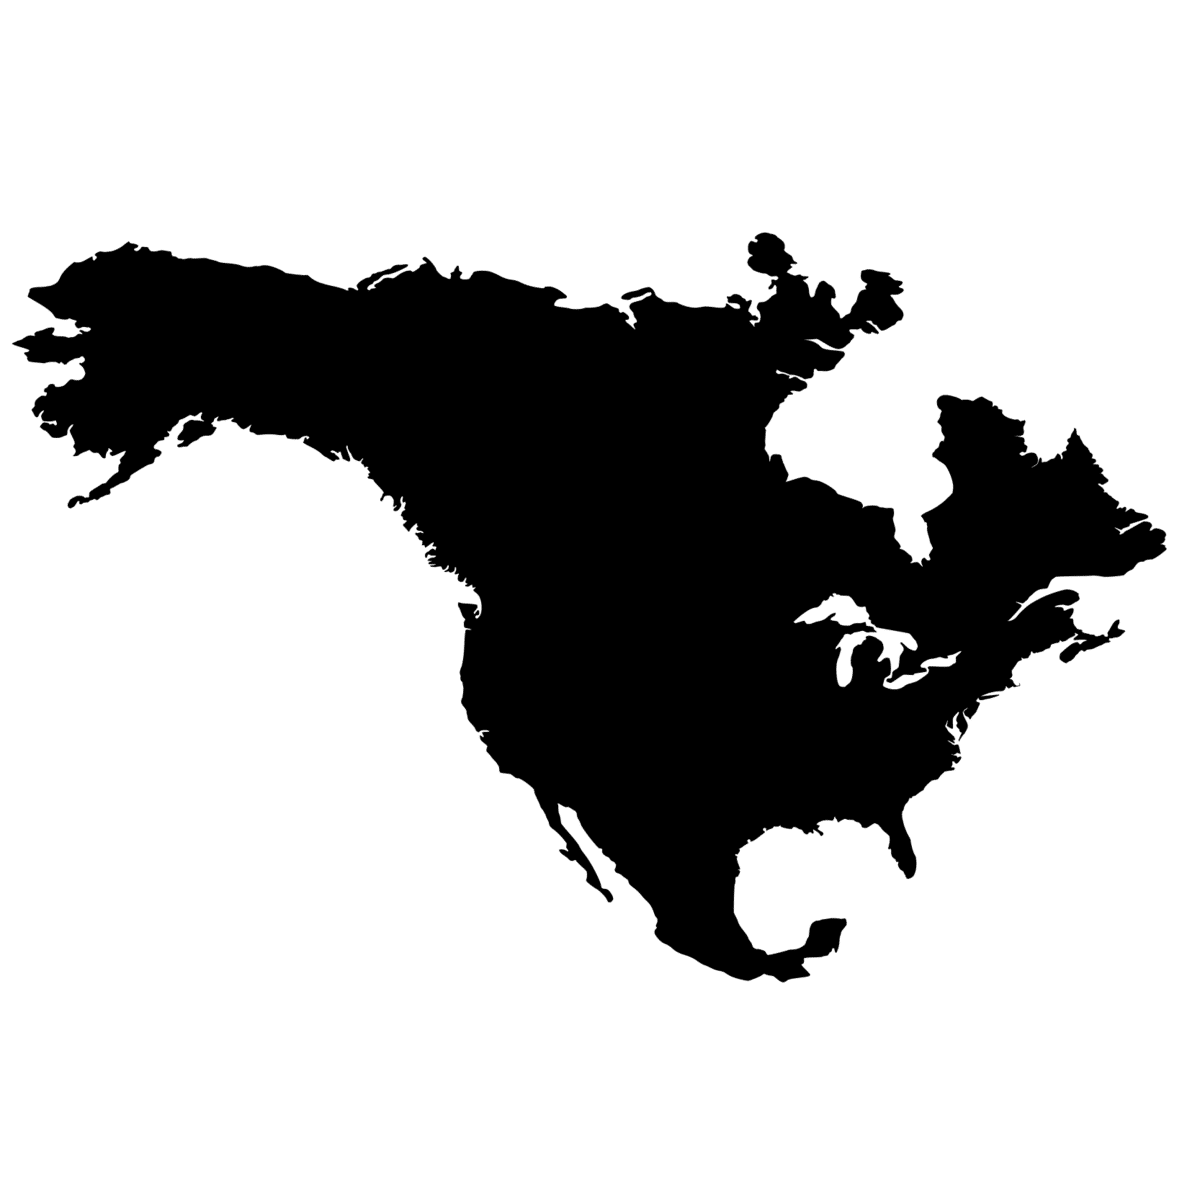 North America & EMEA